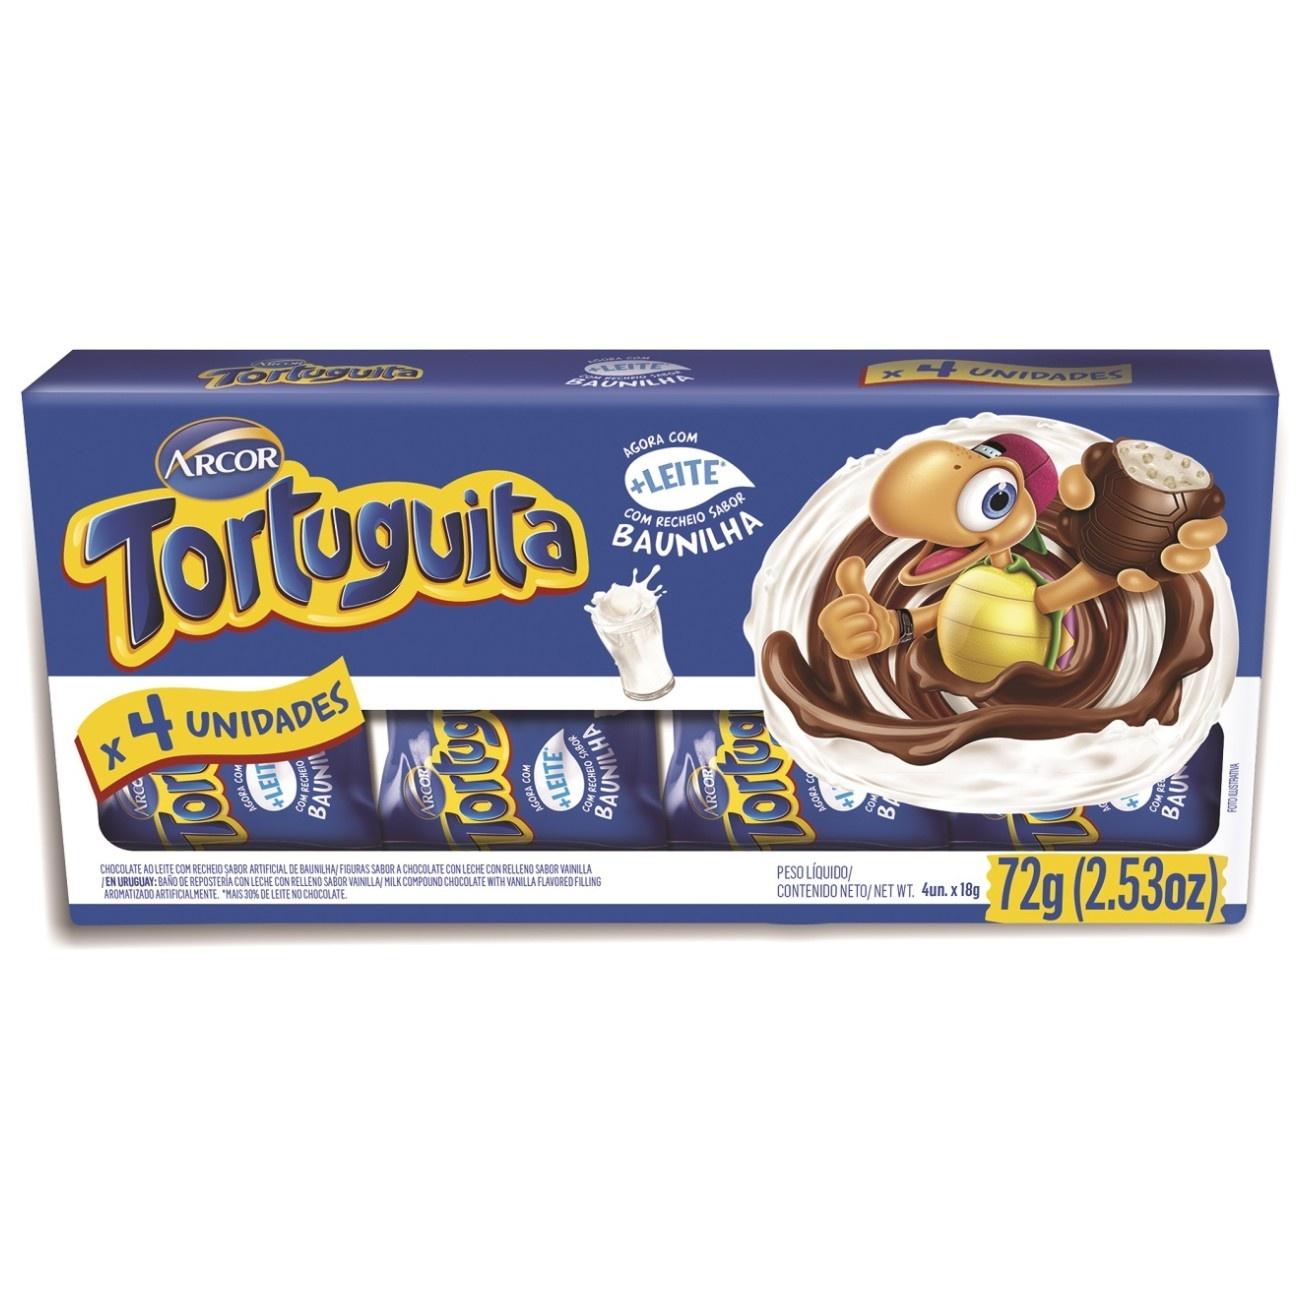 Display de Chocolate Tortuguita ao Leite 18g (4 UN/CADA)